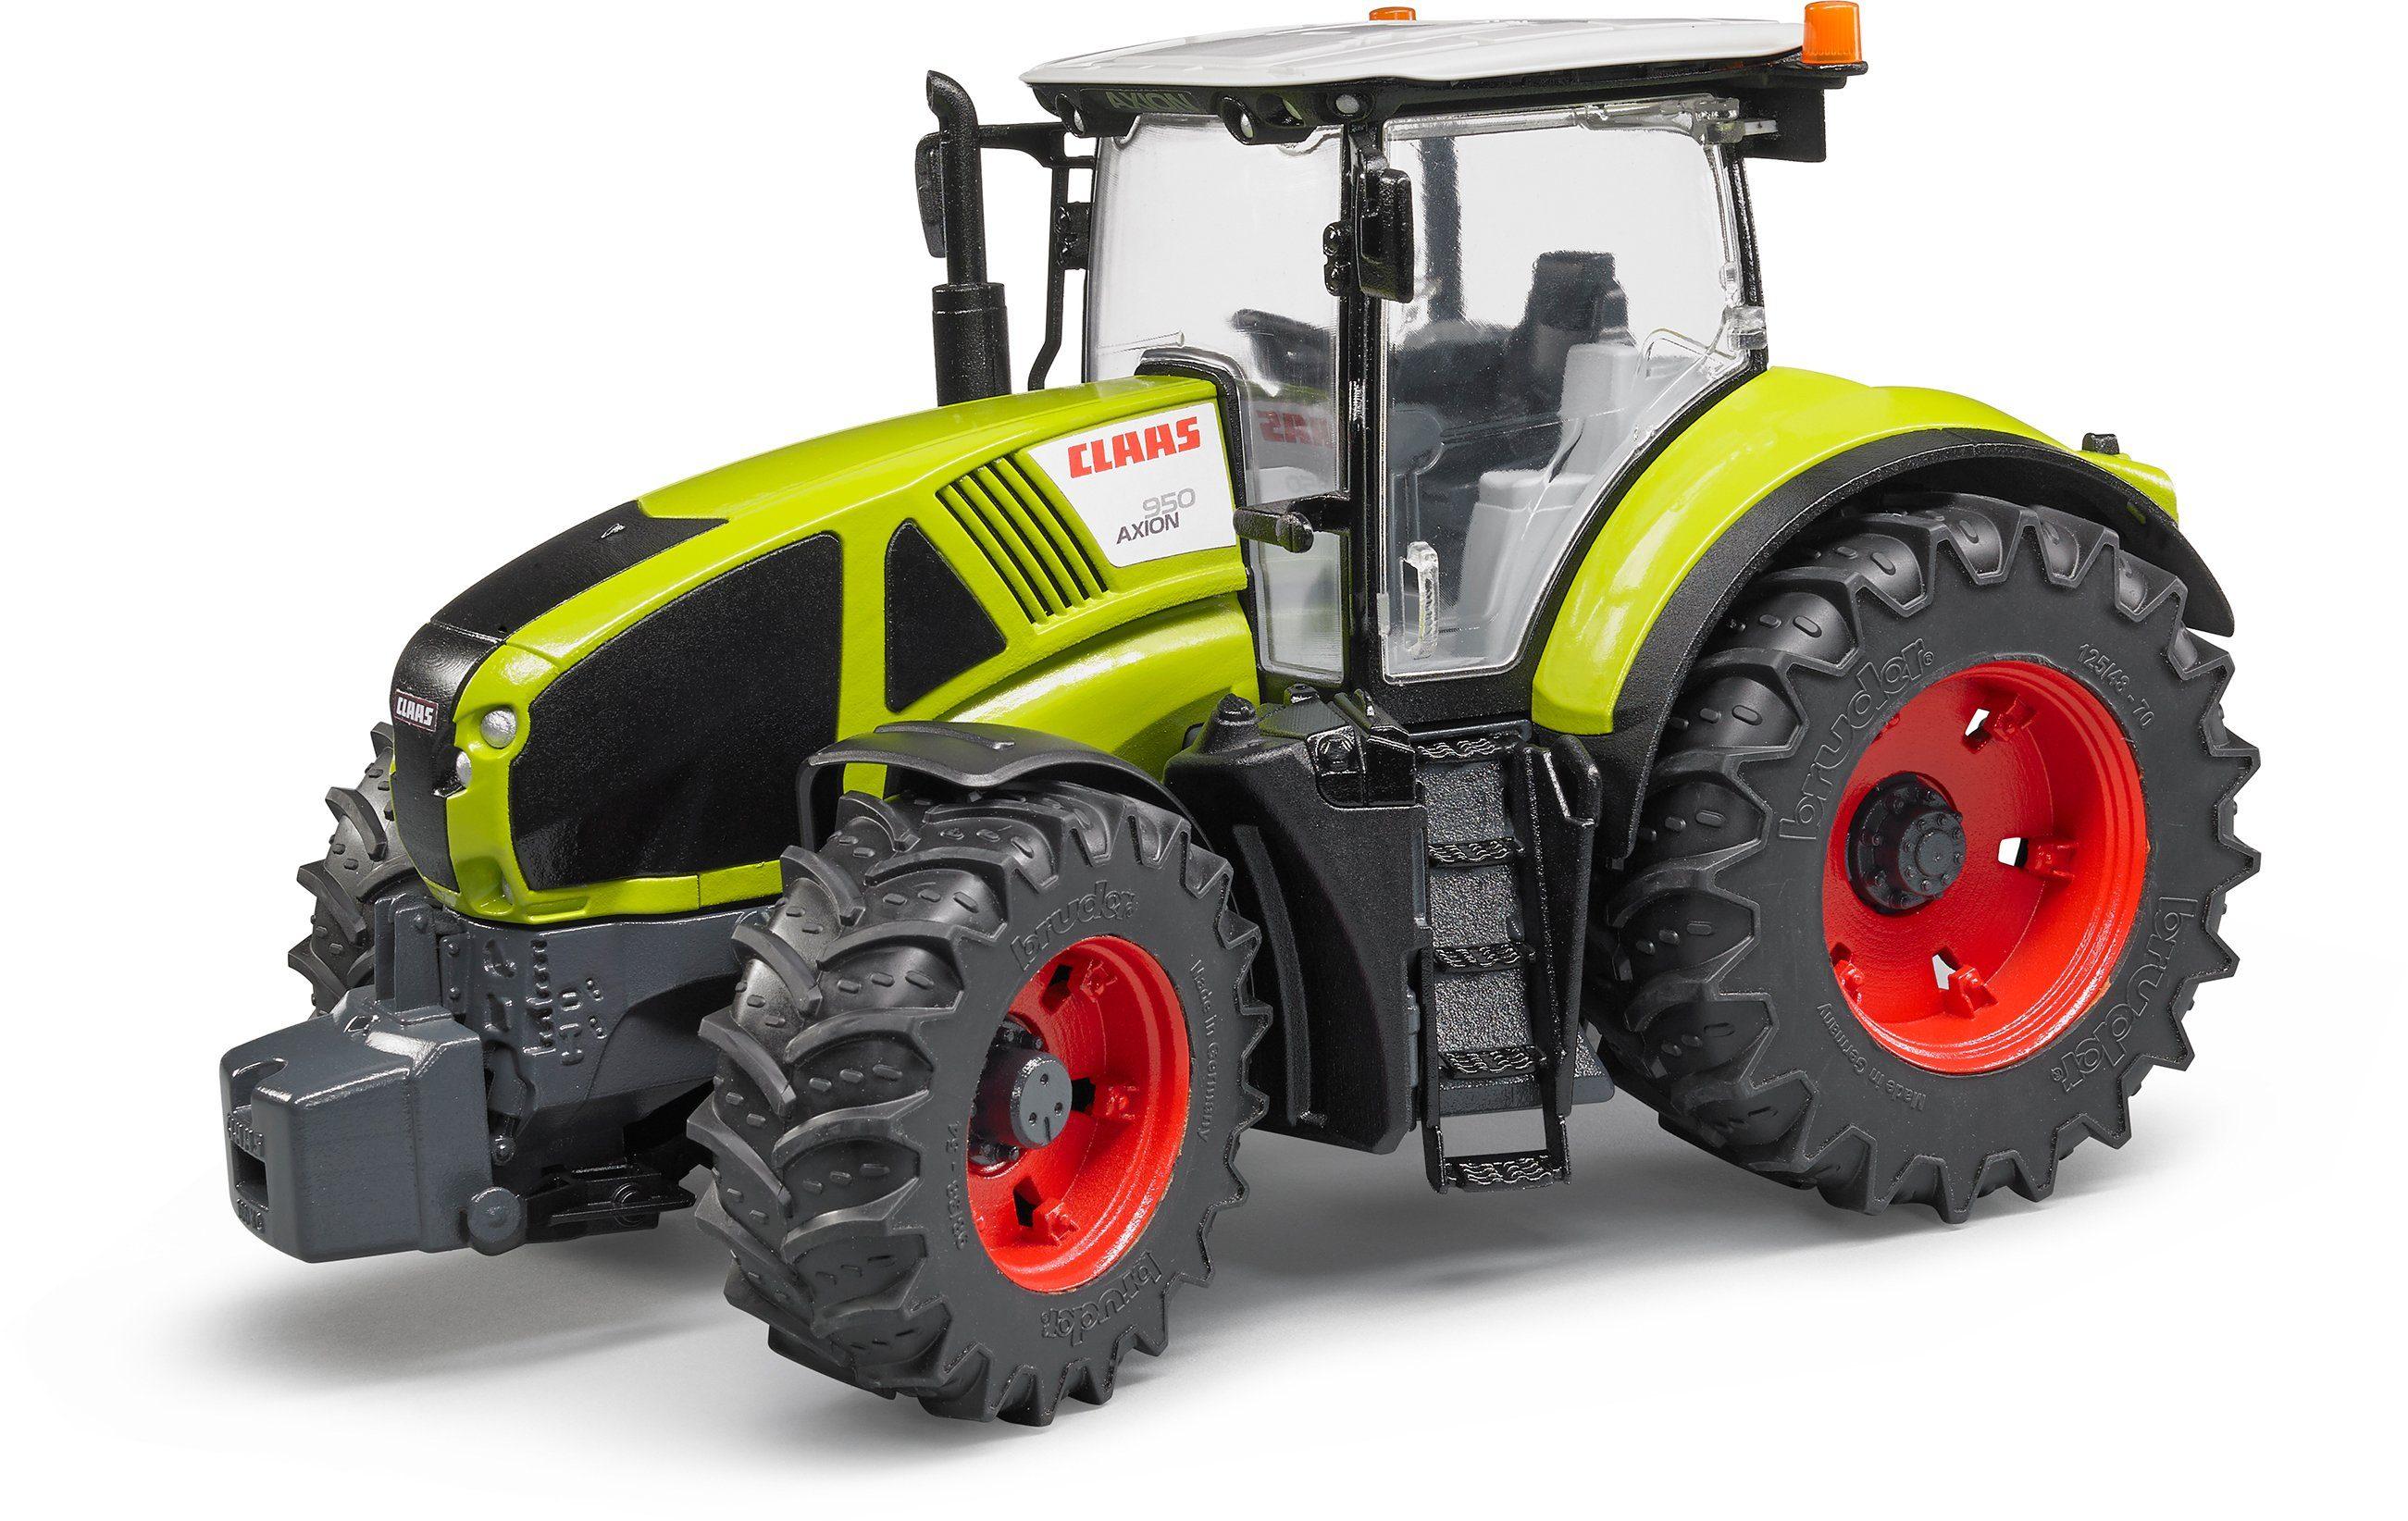 bruder® Spieltraktor mit höhenverstellbarer Heckkupplung 03012, »Claas Axion 950, Maßstab 1:16«